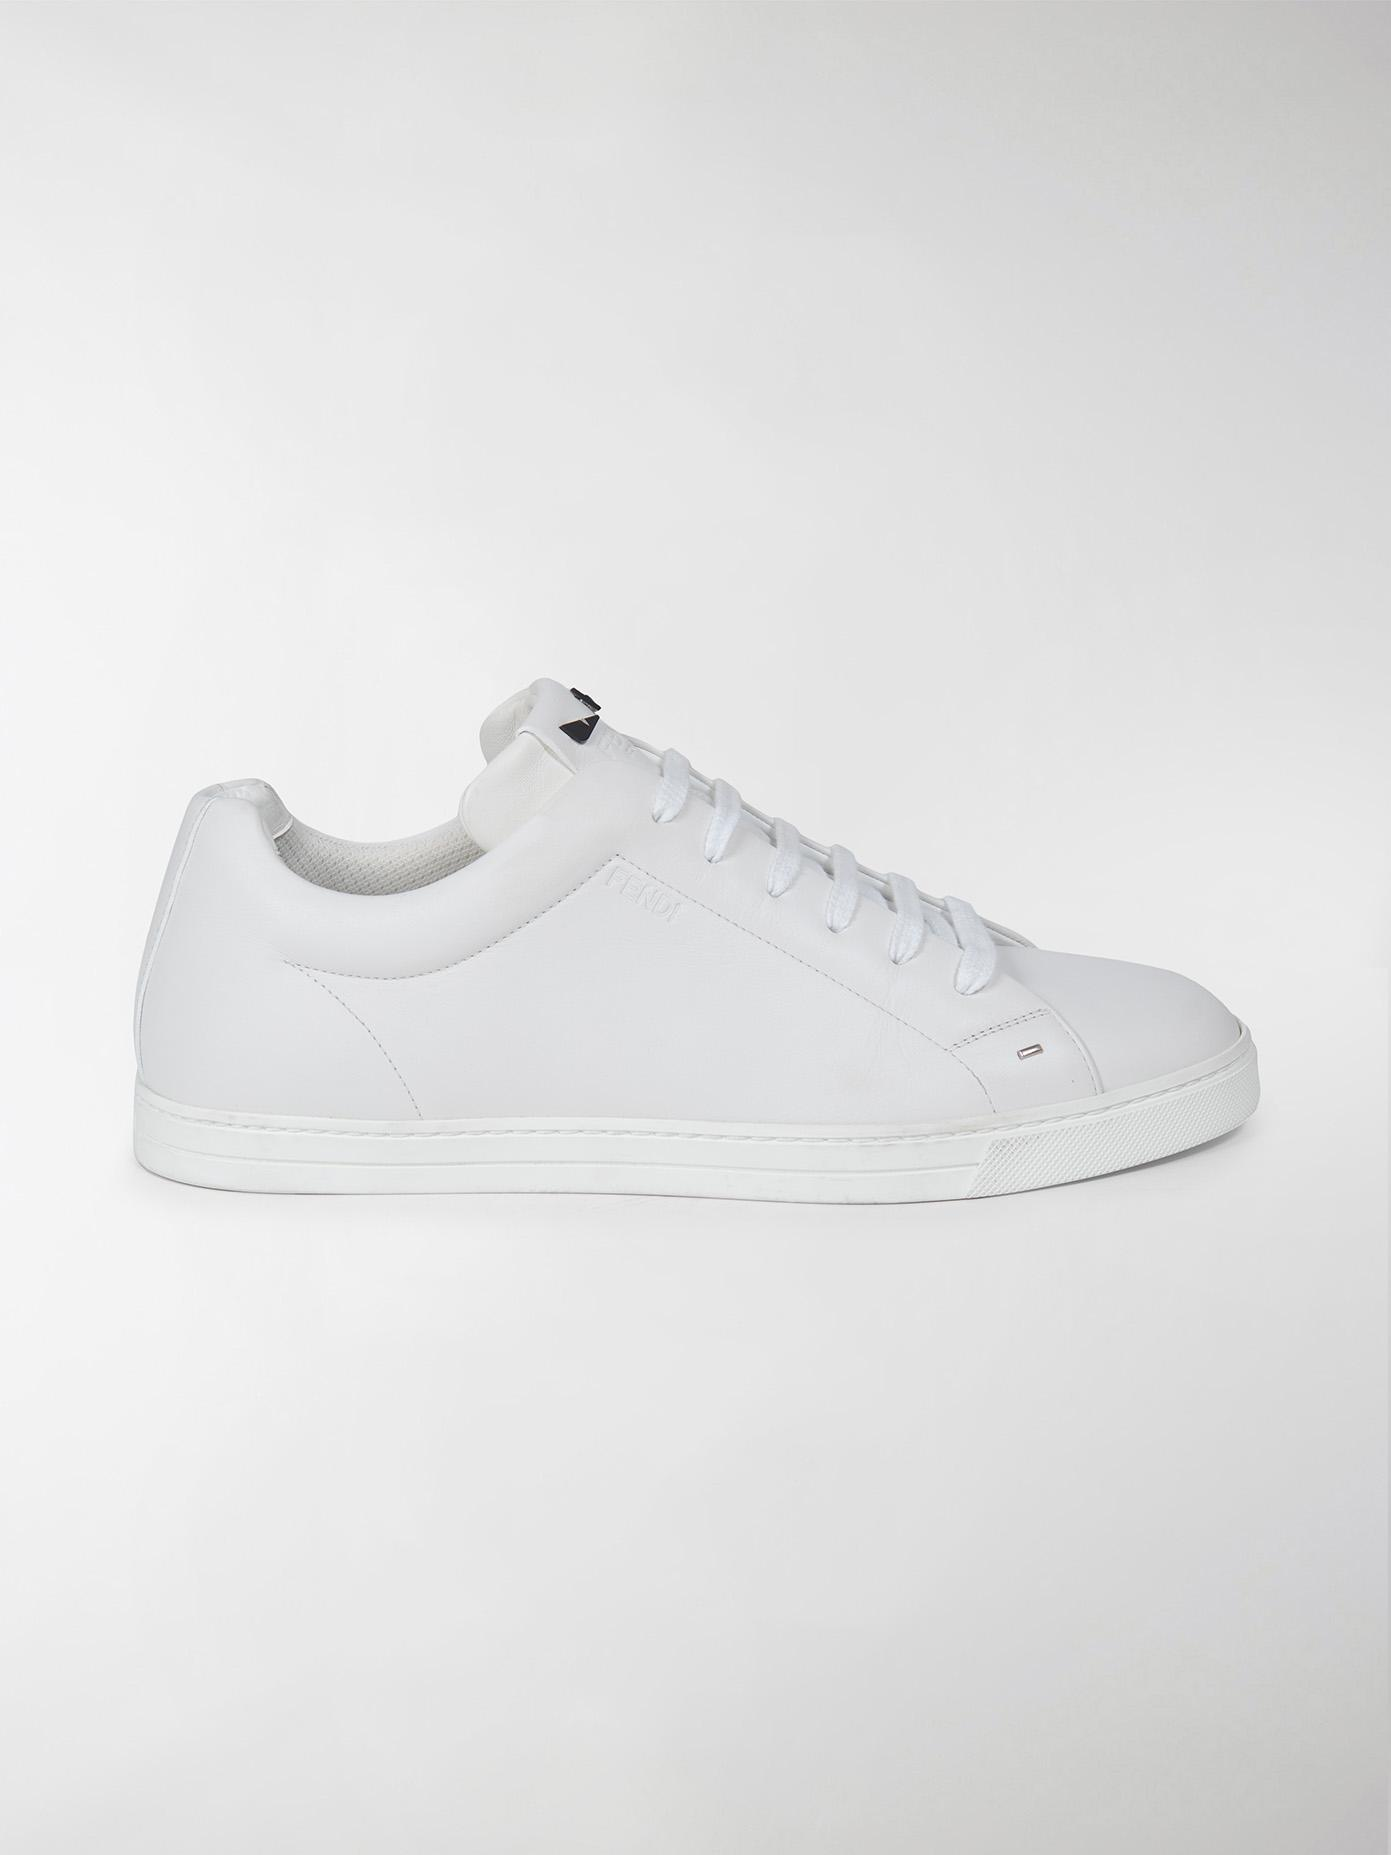 3e8b405165 Fendi White Leather Sneakers Small Eyes for men